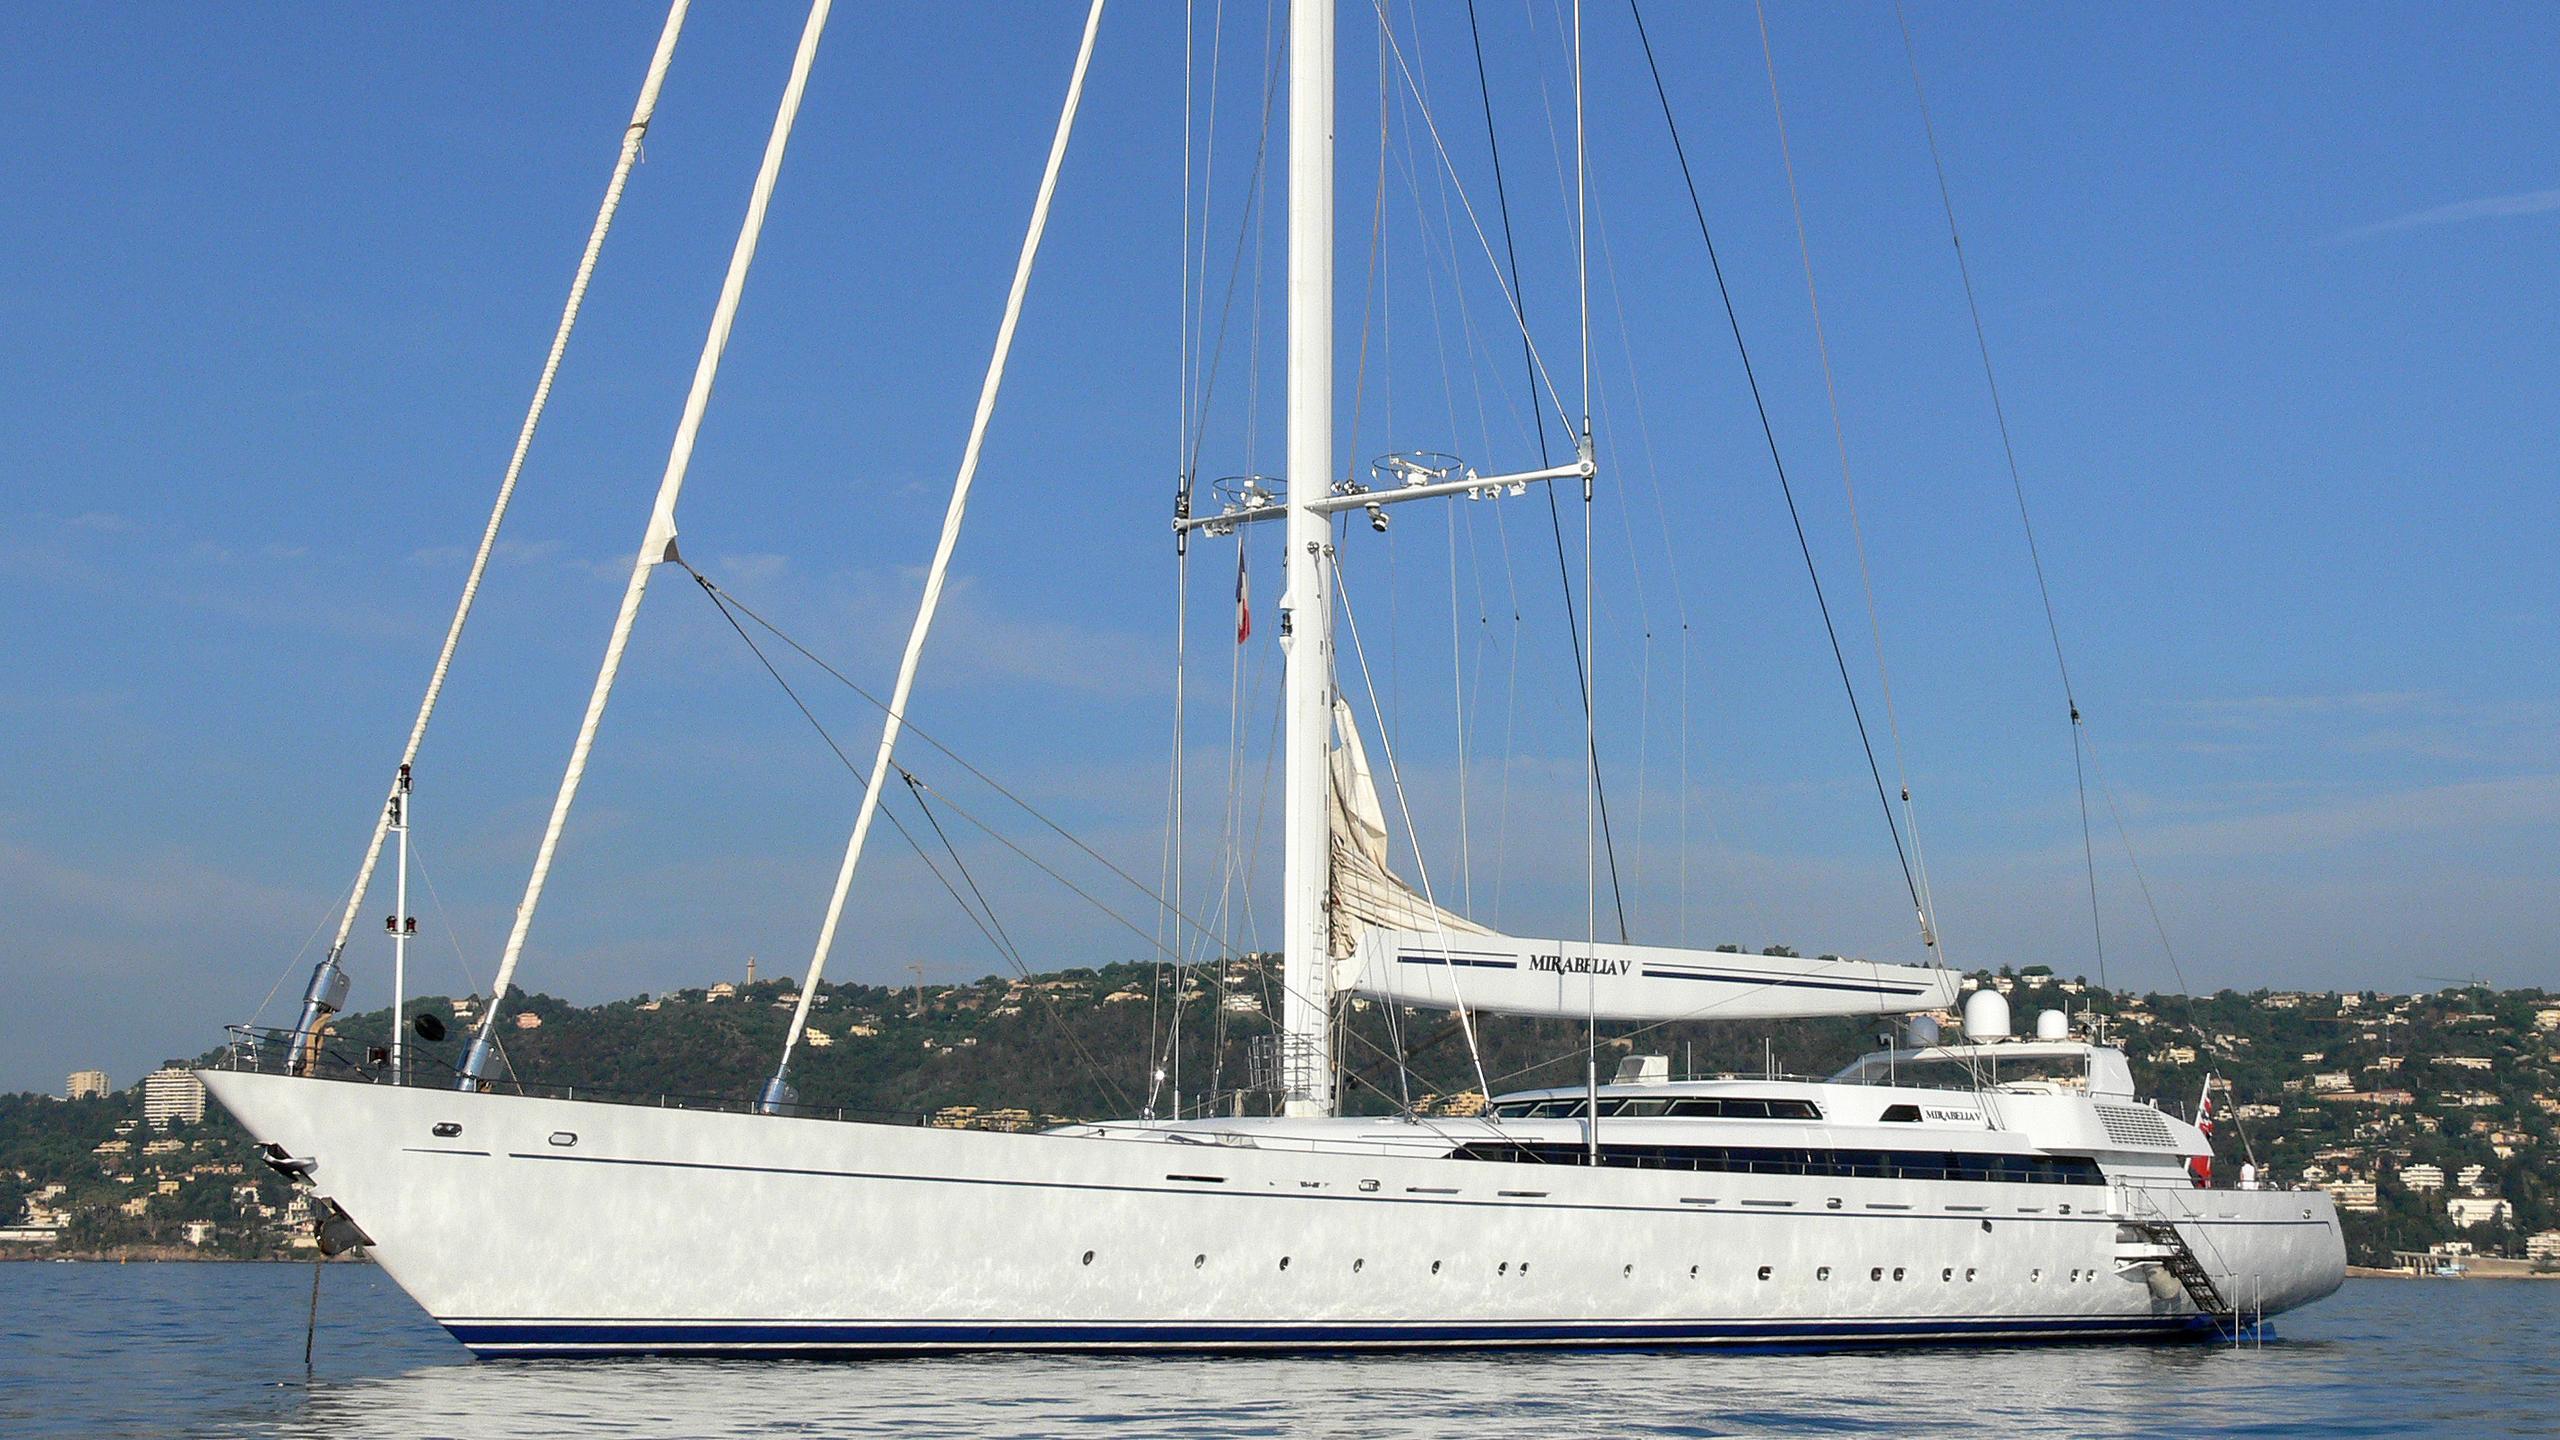 m5-sailing-yacht-vosper-thornycroft-2004-79m-profile-before-refit